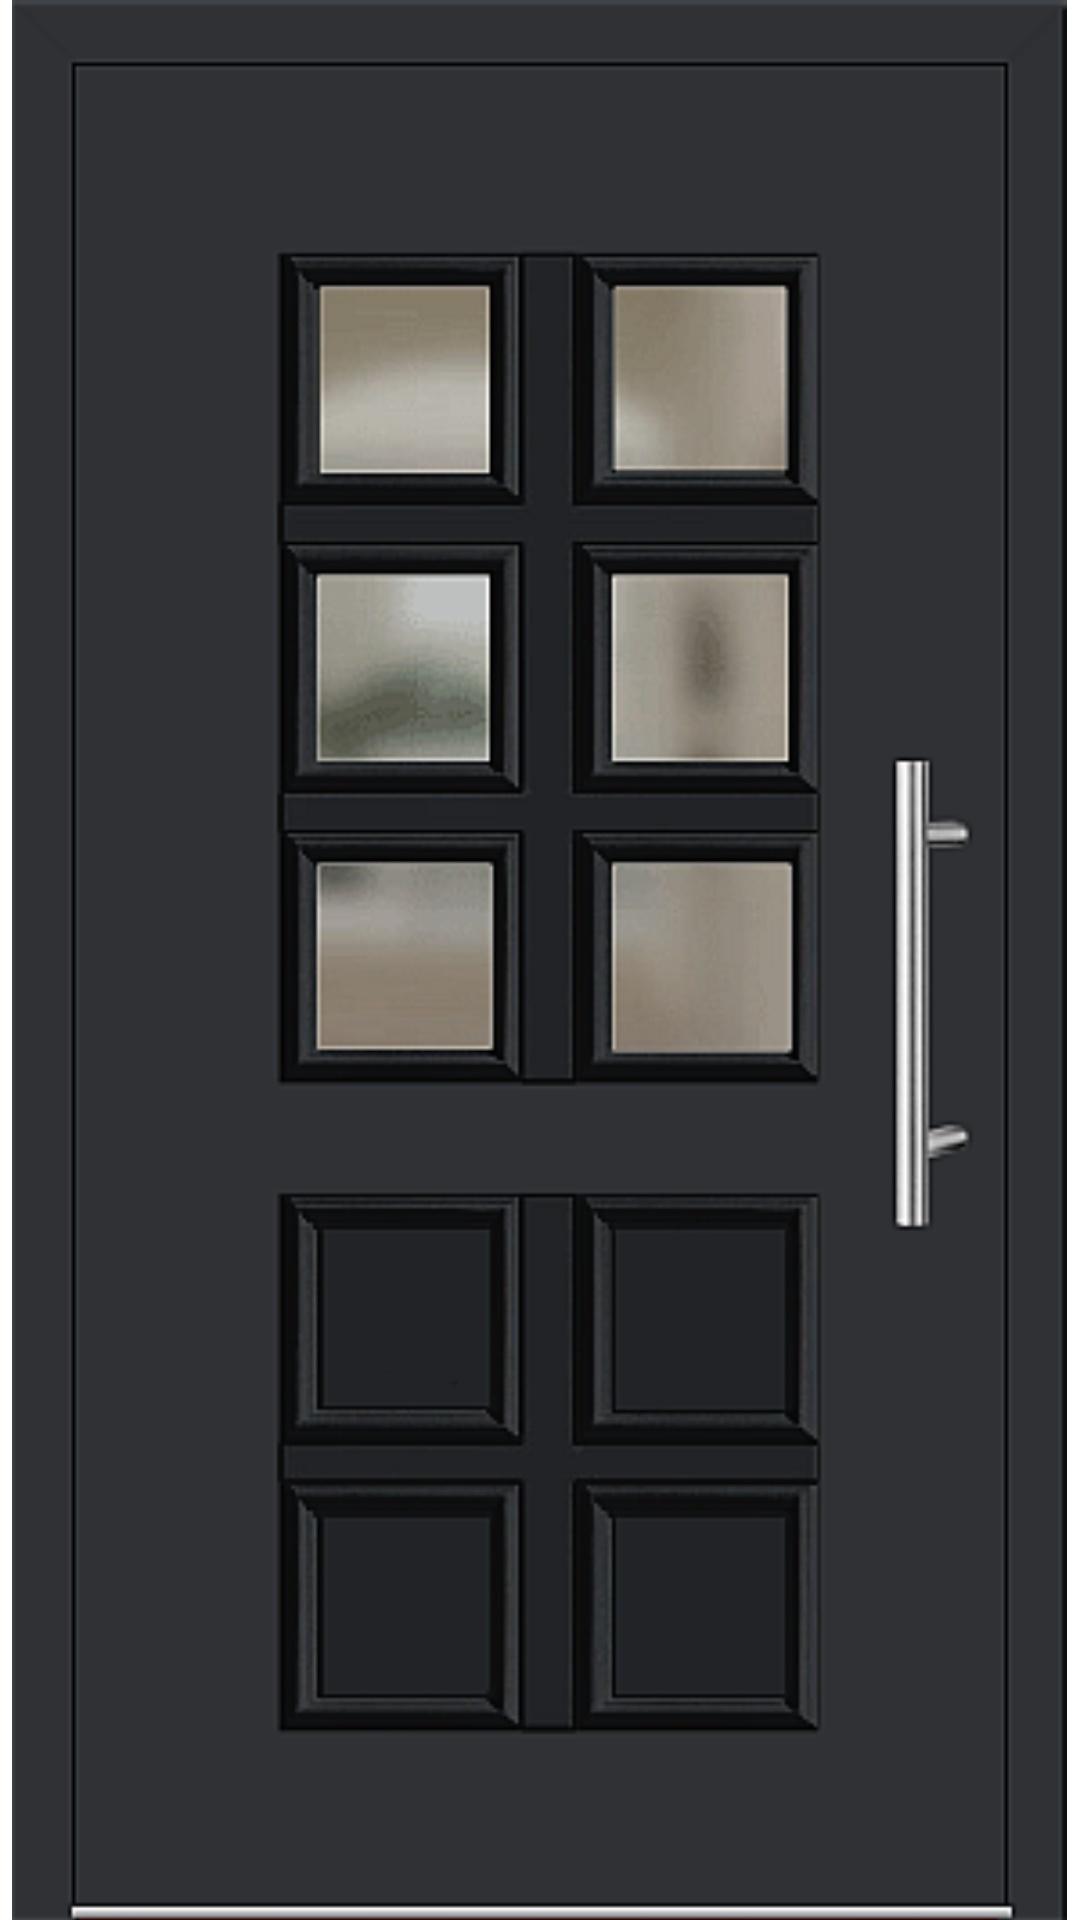 Aluminium Haustür Modell 205-10 schwarz